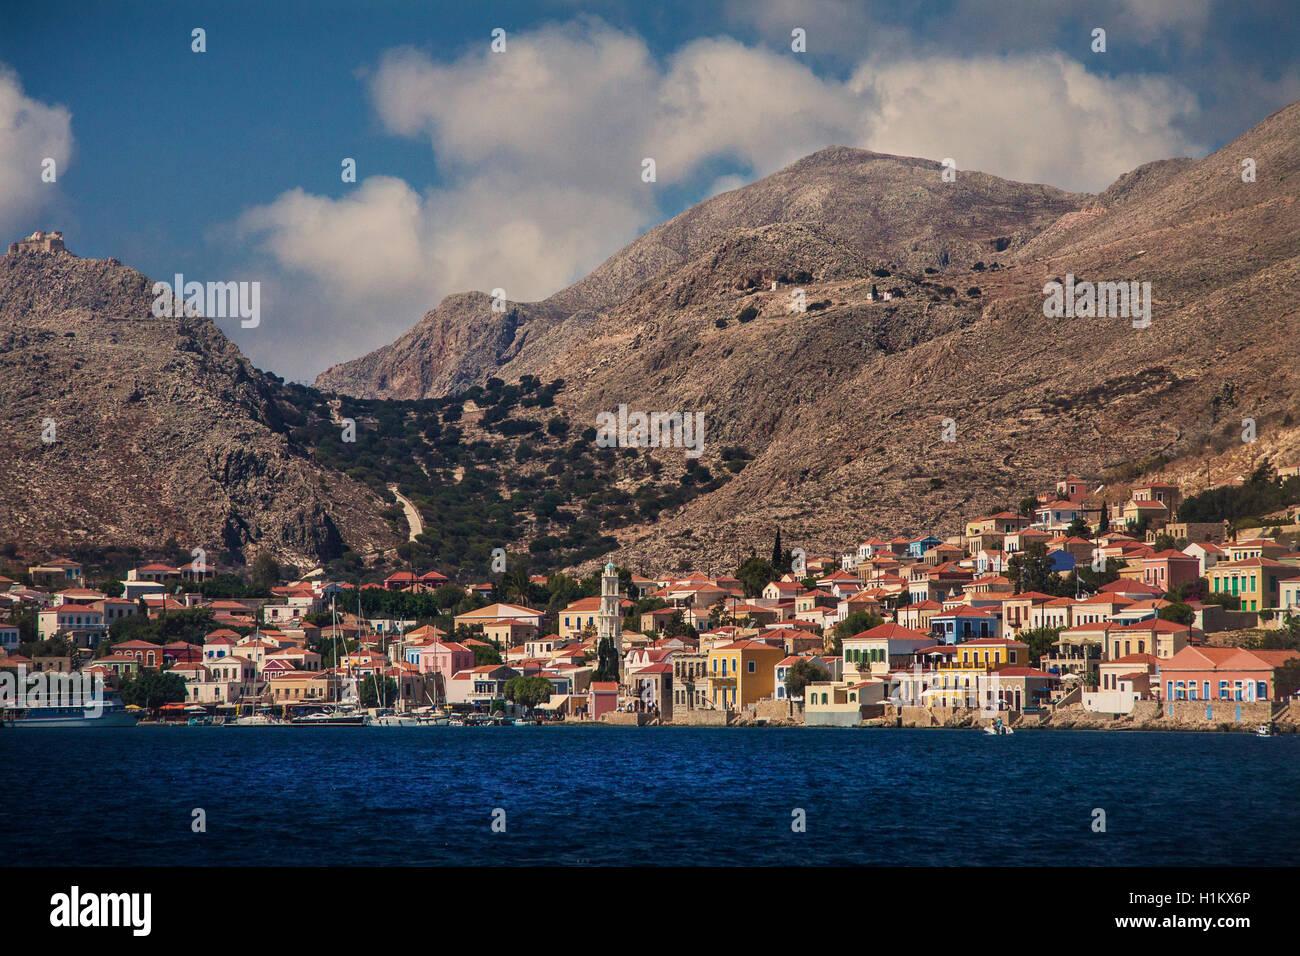 Halki Greece from the sea - Stock Image